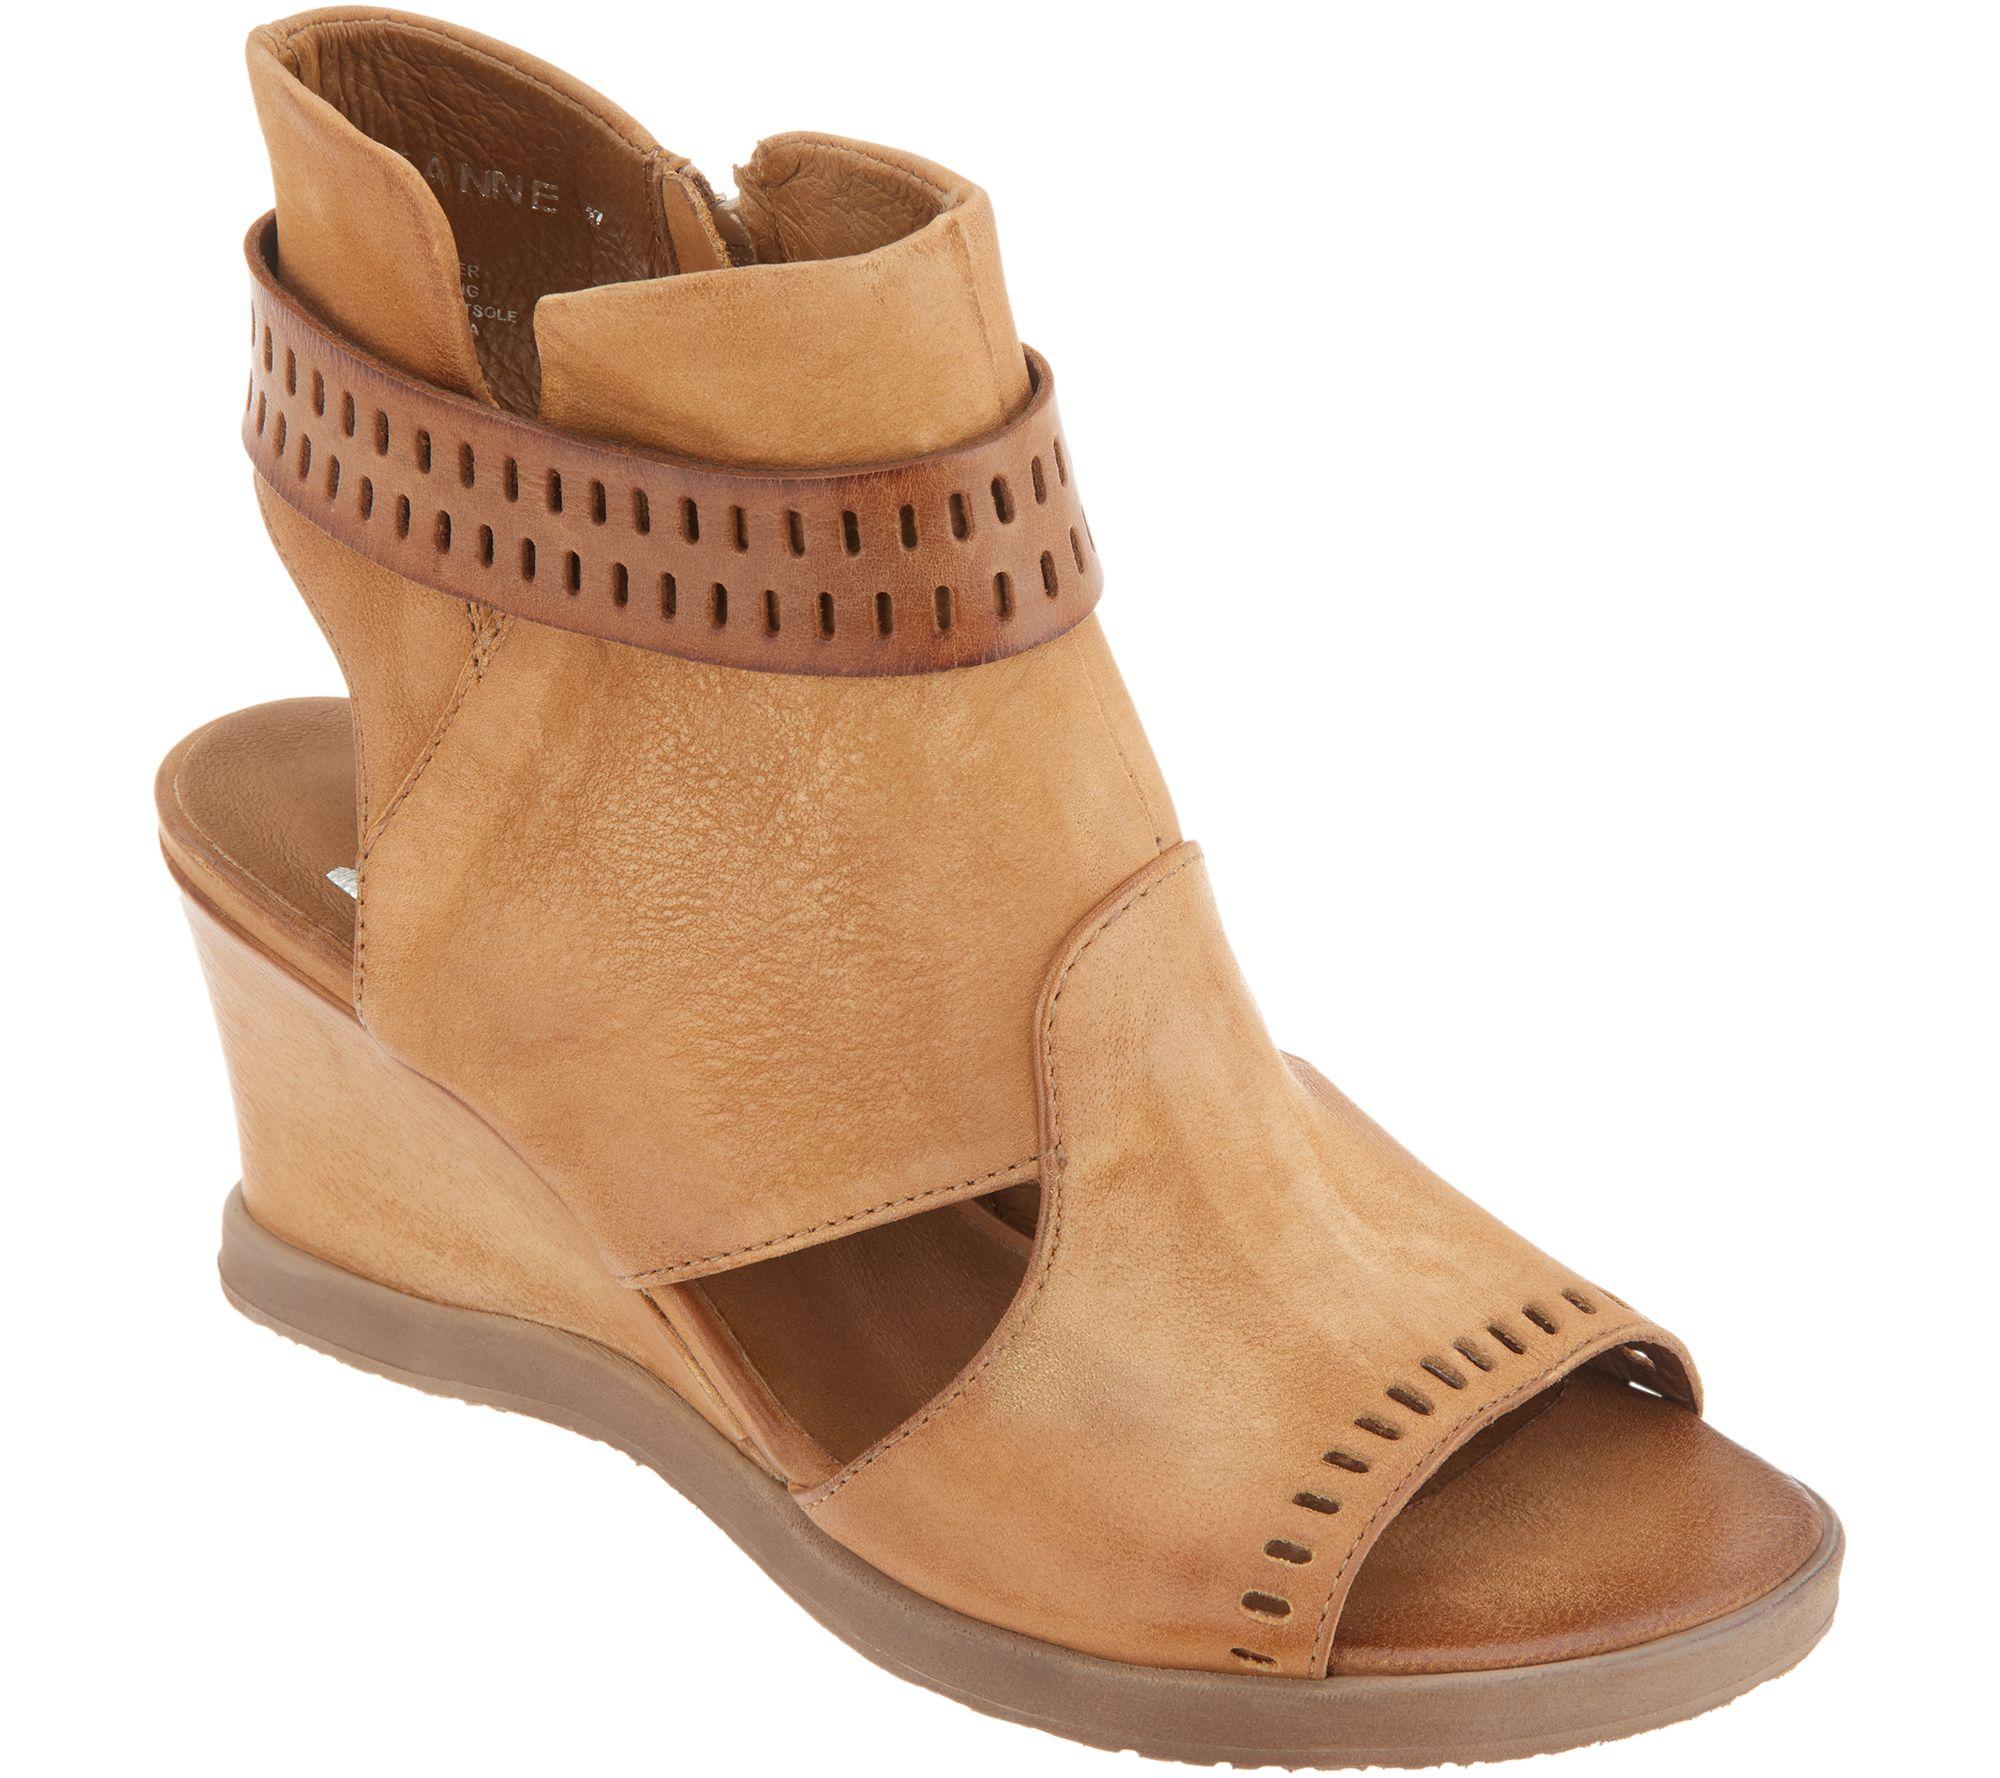 857f54d5435d Miz Mooz Leather Cutout Wedge Sandals - Brianne - Page 1 — QVC.com